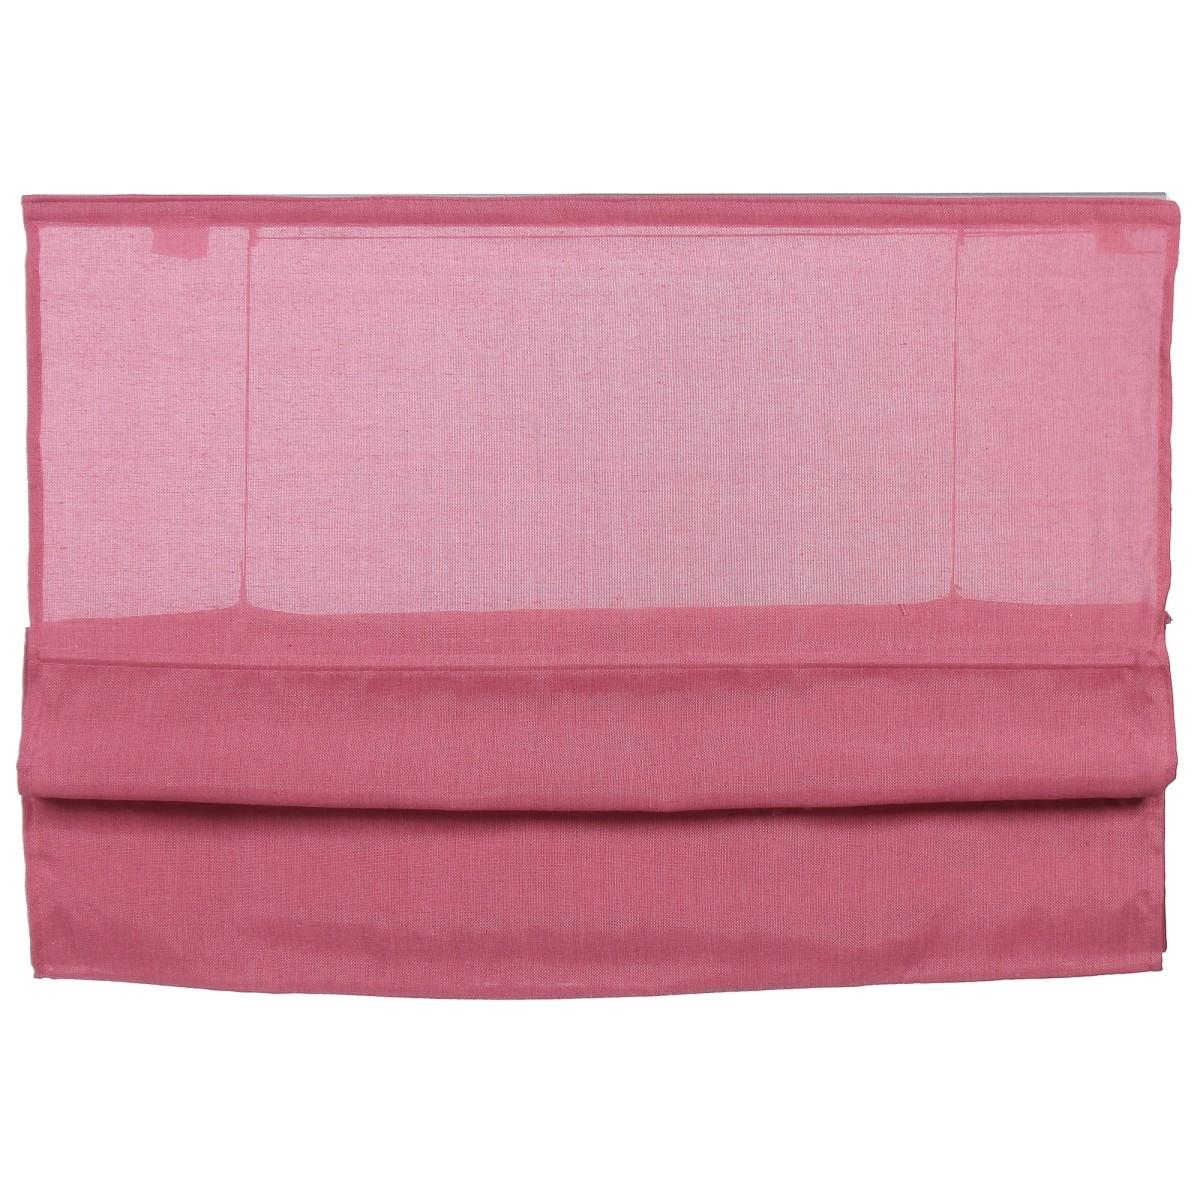 Штора римская Натур 120х160 см цвет розовый